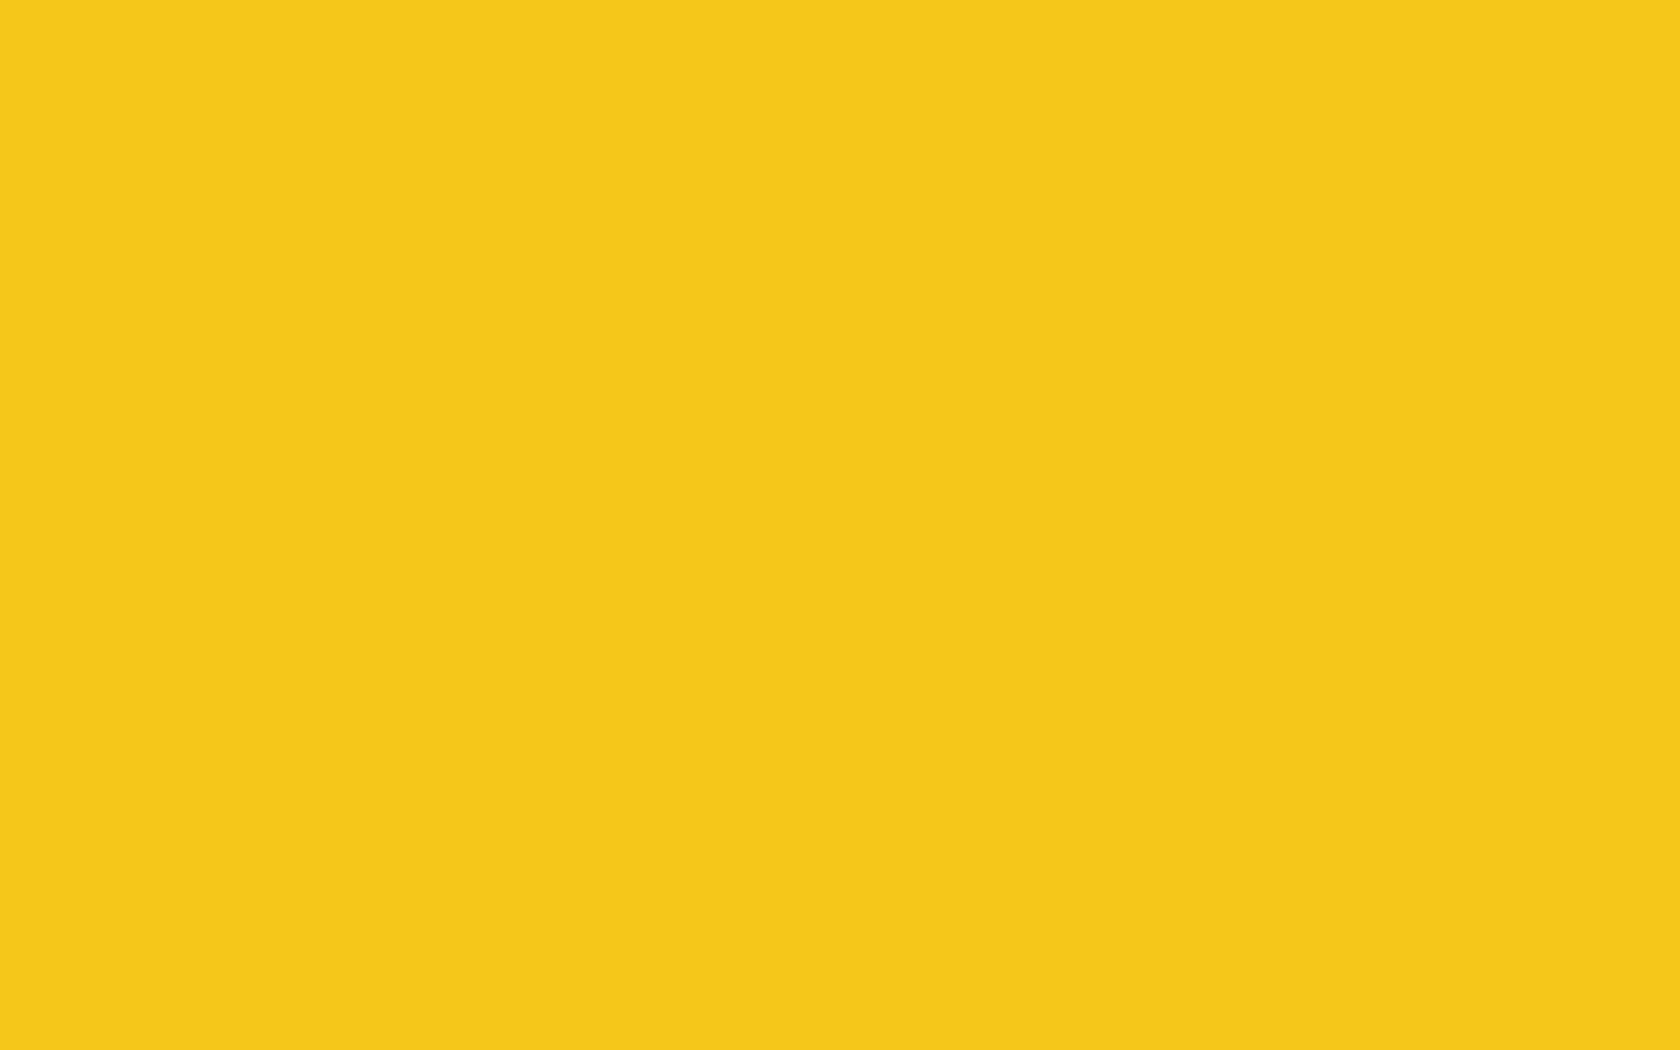 1680x1050 Deep Lemon Solid Color Background